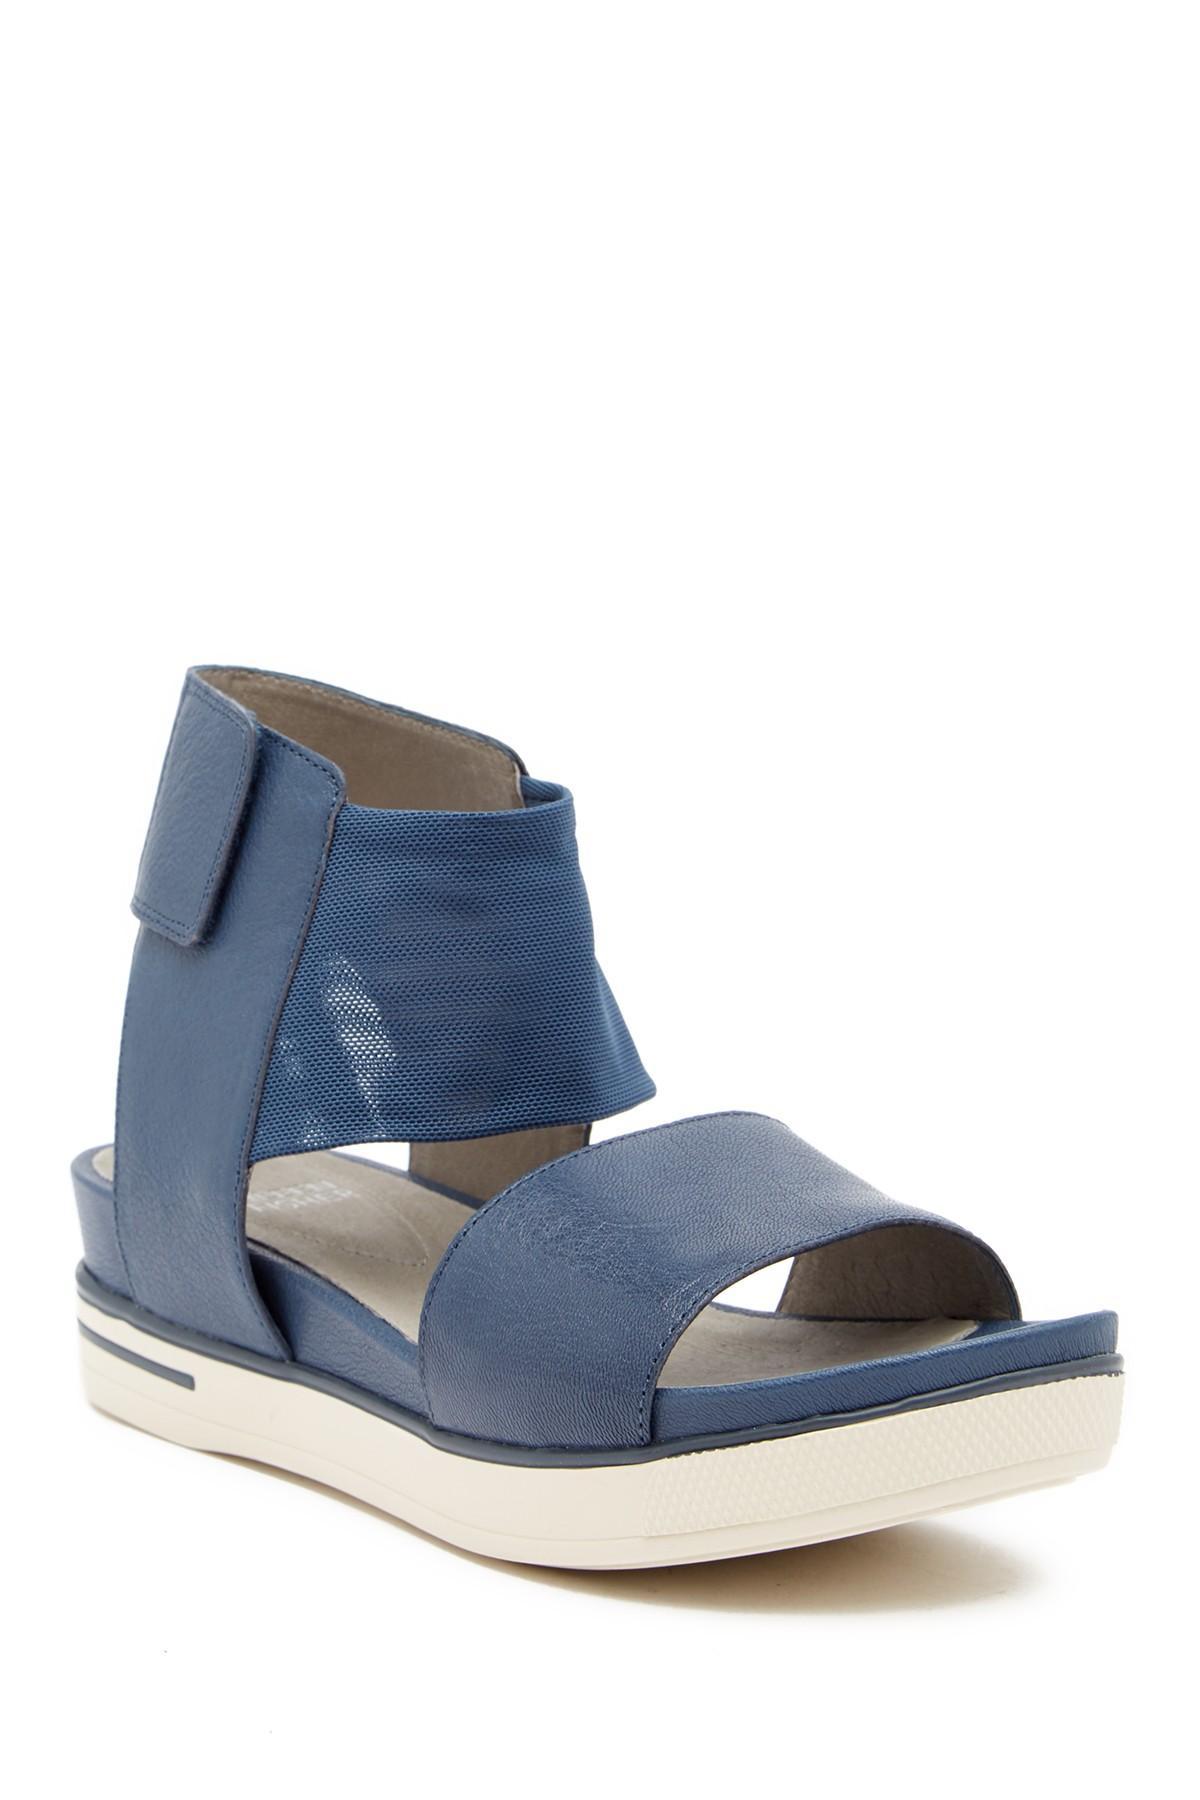 81f46d361f60 Lyst - Eileen Fisher Spree Platform Sport Wedge Sandal in Blue